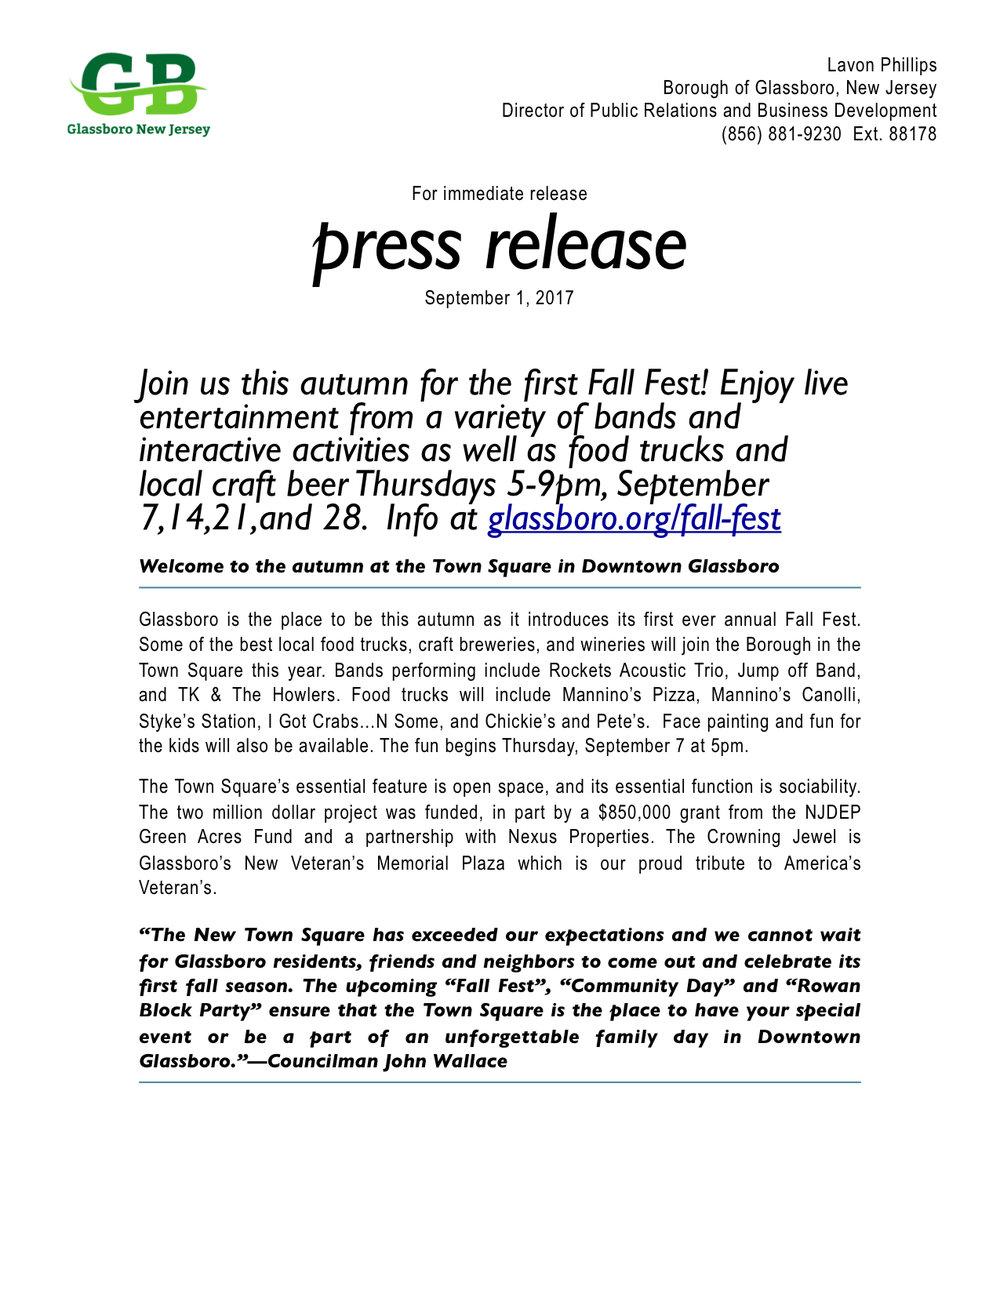 Glassboro NJ Fall Fest Press release .jpeg